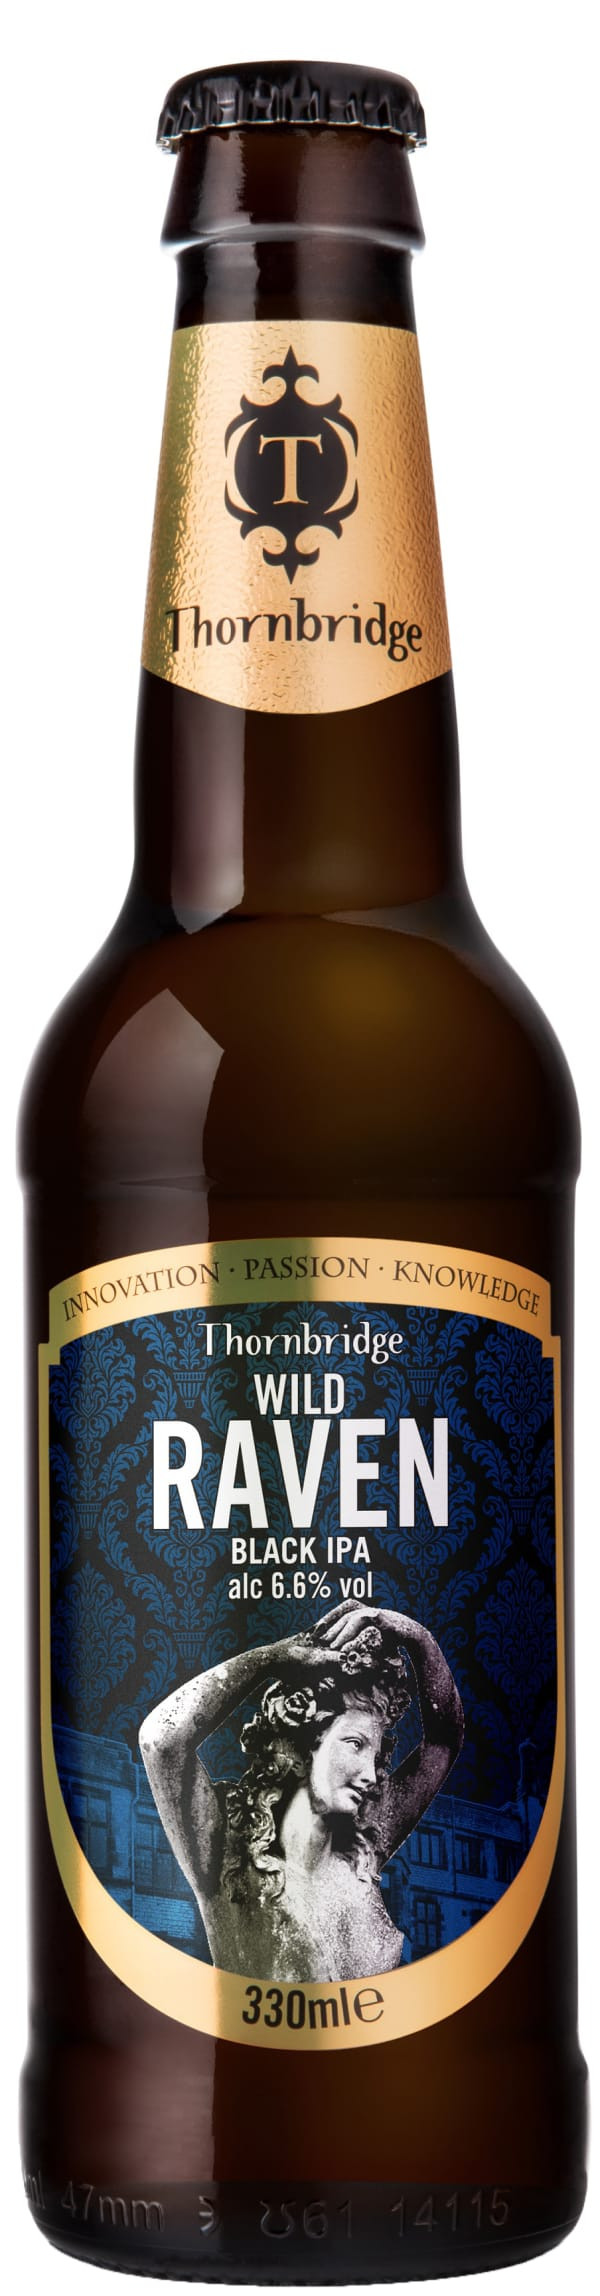 Thornbridge Wild Raven Black IPA